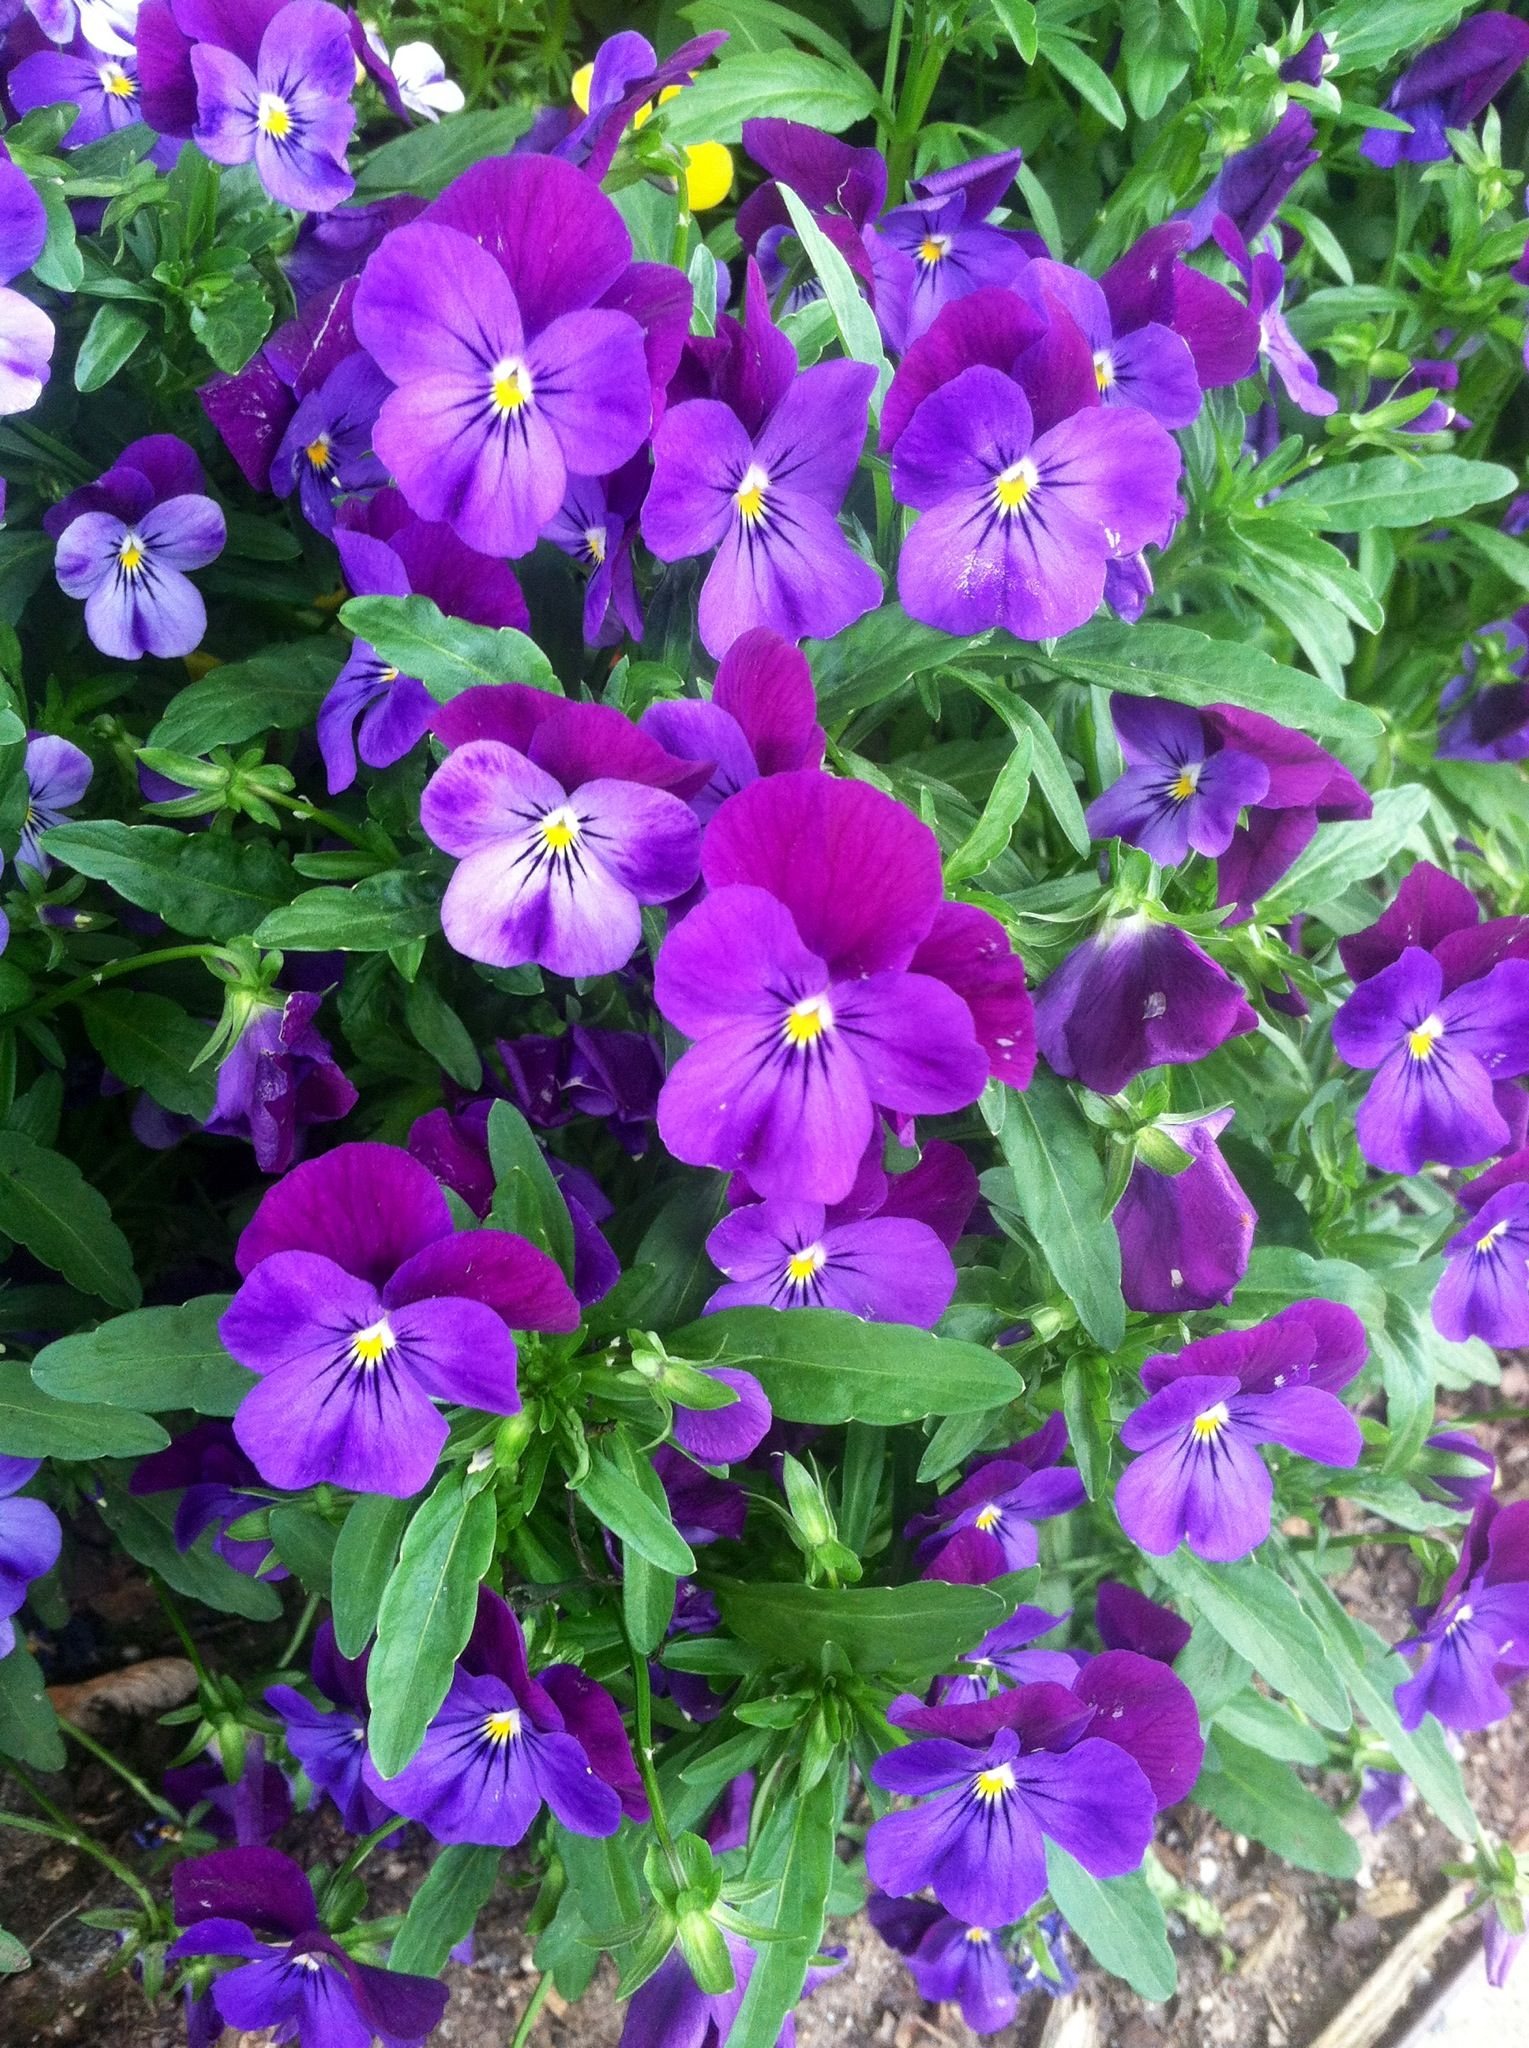 Violas are pretty dainty flowers that thrive in cool weather this violas are pretty dainty flowers that thrive in cool weather this makes them perfect mightylinksfo